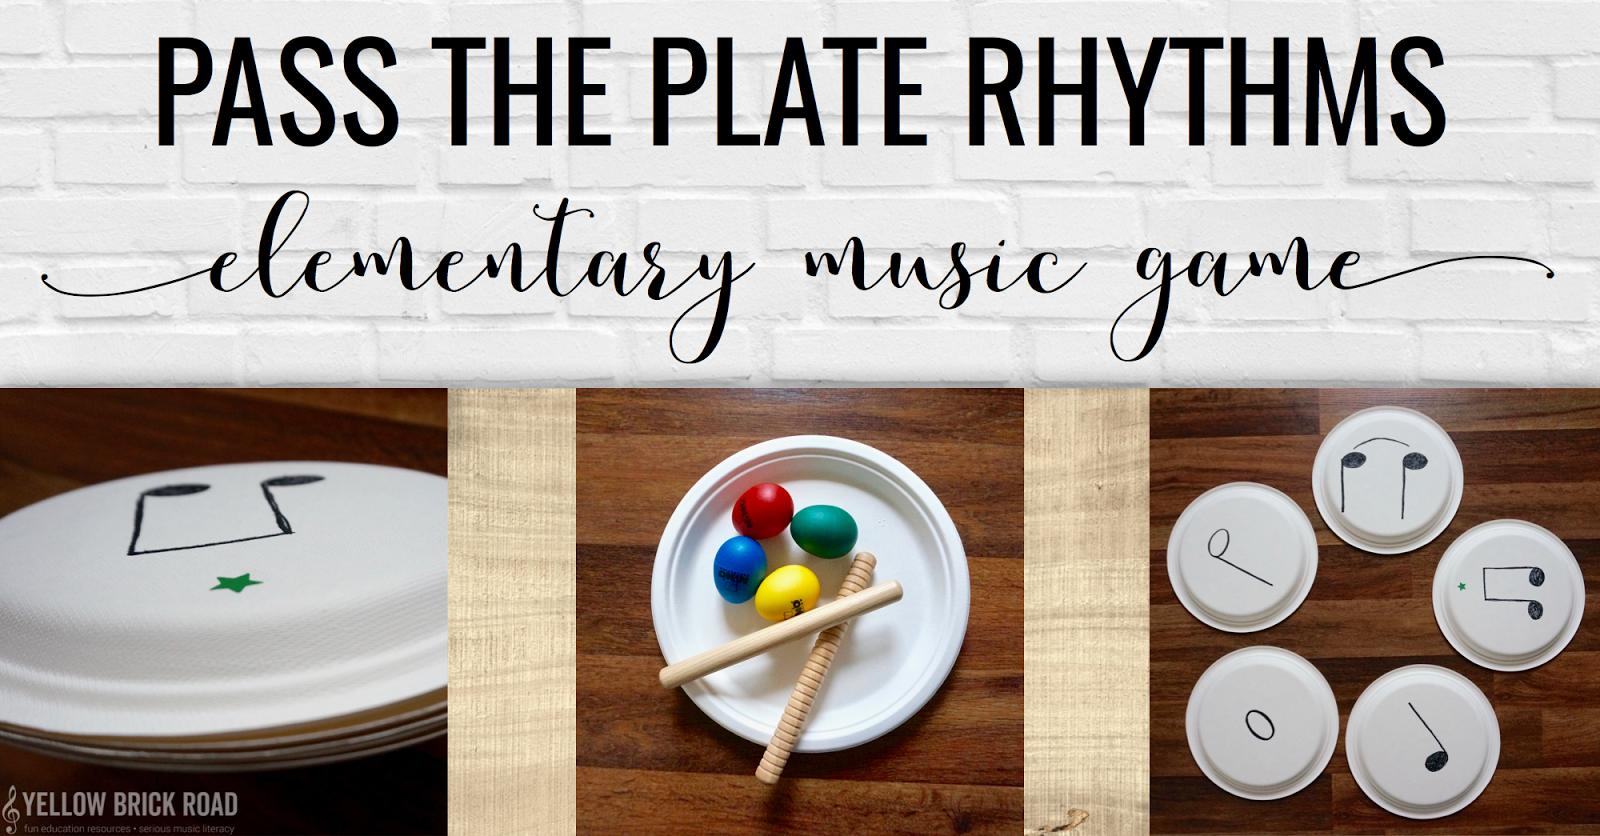 Pass The Plate Rhythms